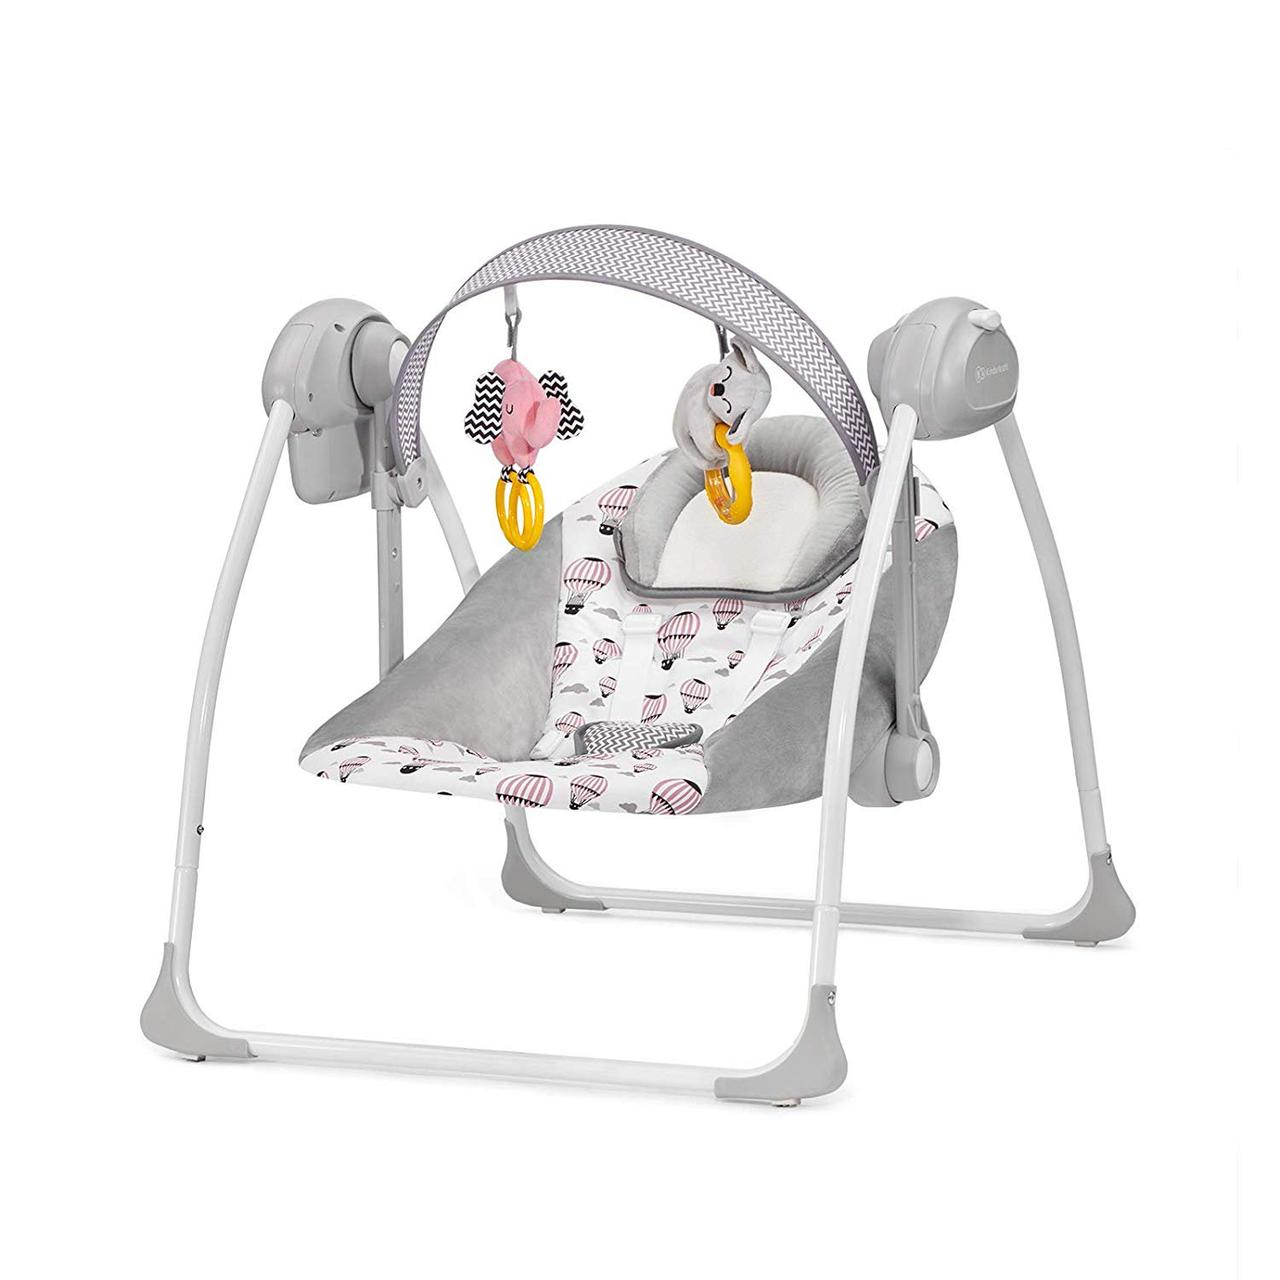 Кресло-качалка Kinderkraft Flo Pink +ВИДЕО